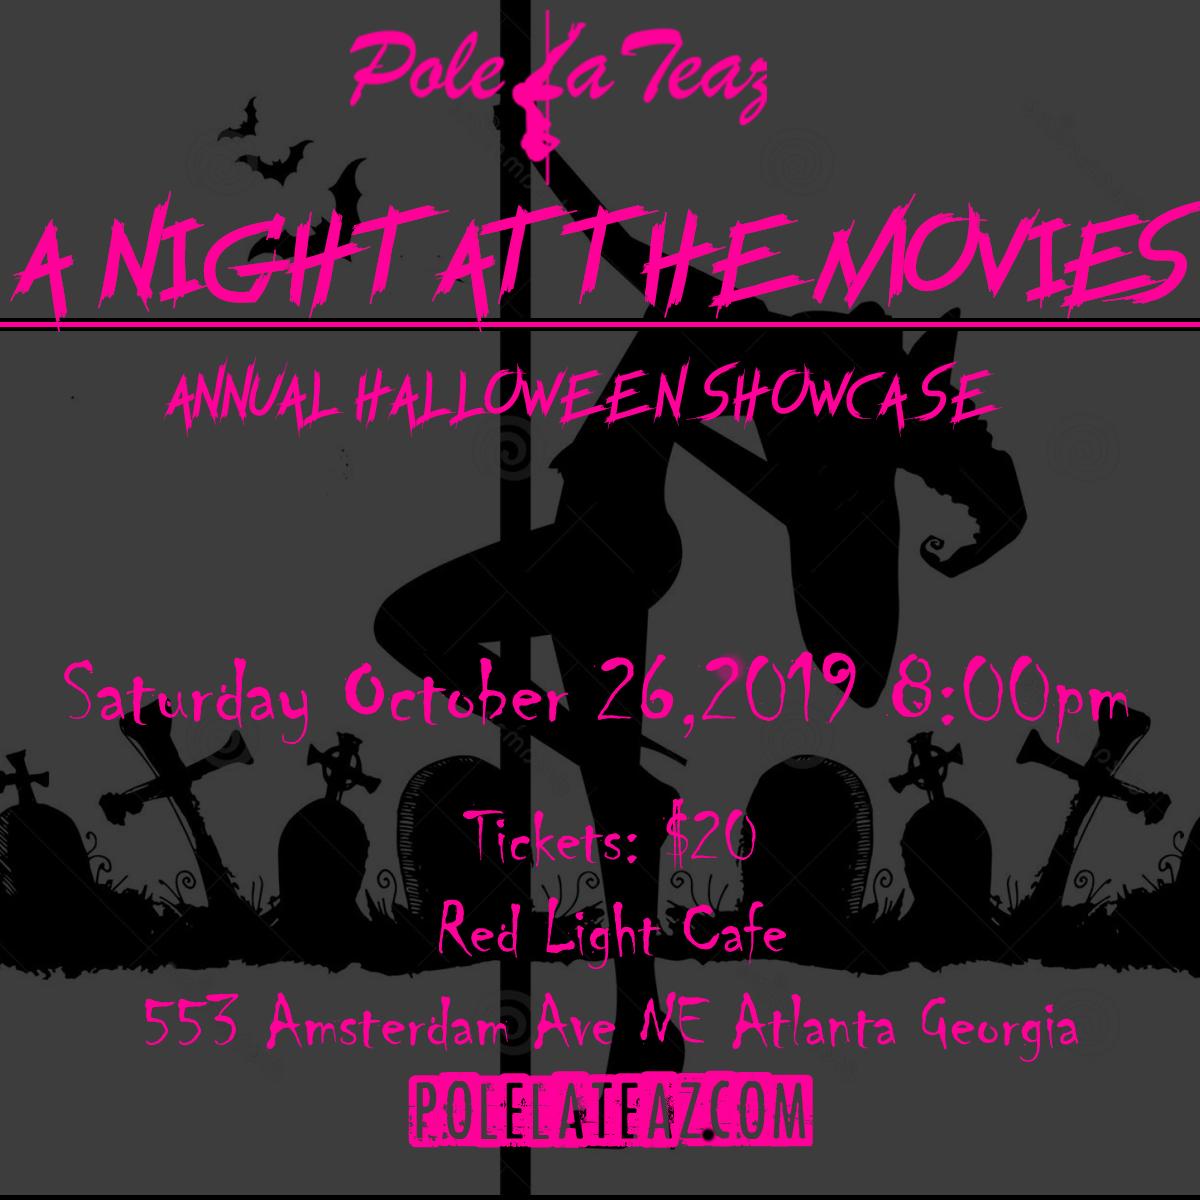 PoleLaTeaz presents 'A Night At The Movies' Halloween Showcase — October 26, 2019 — Red Light Café, Atlanta, GA